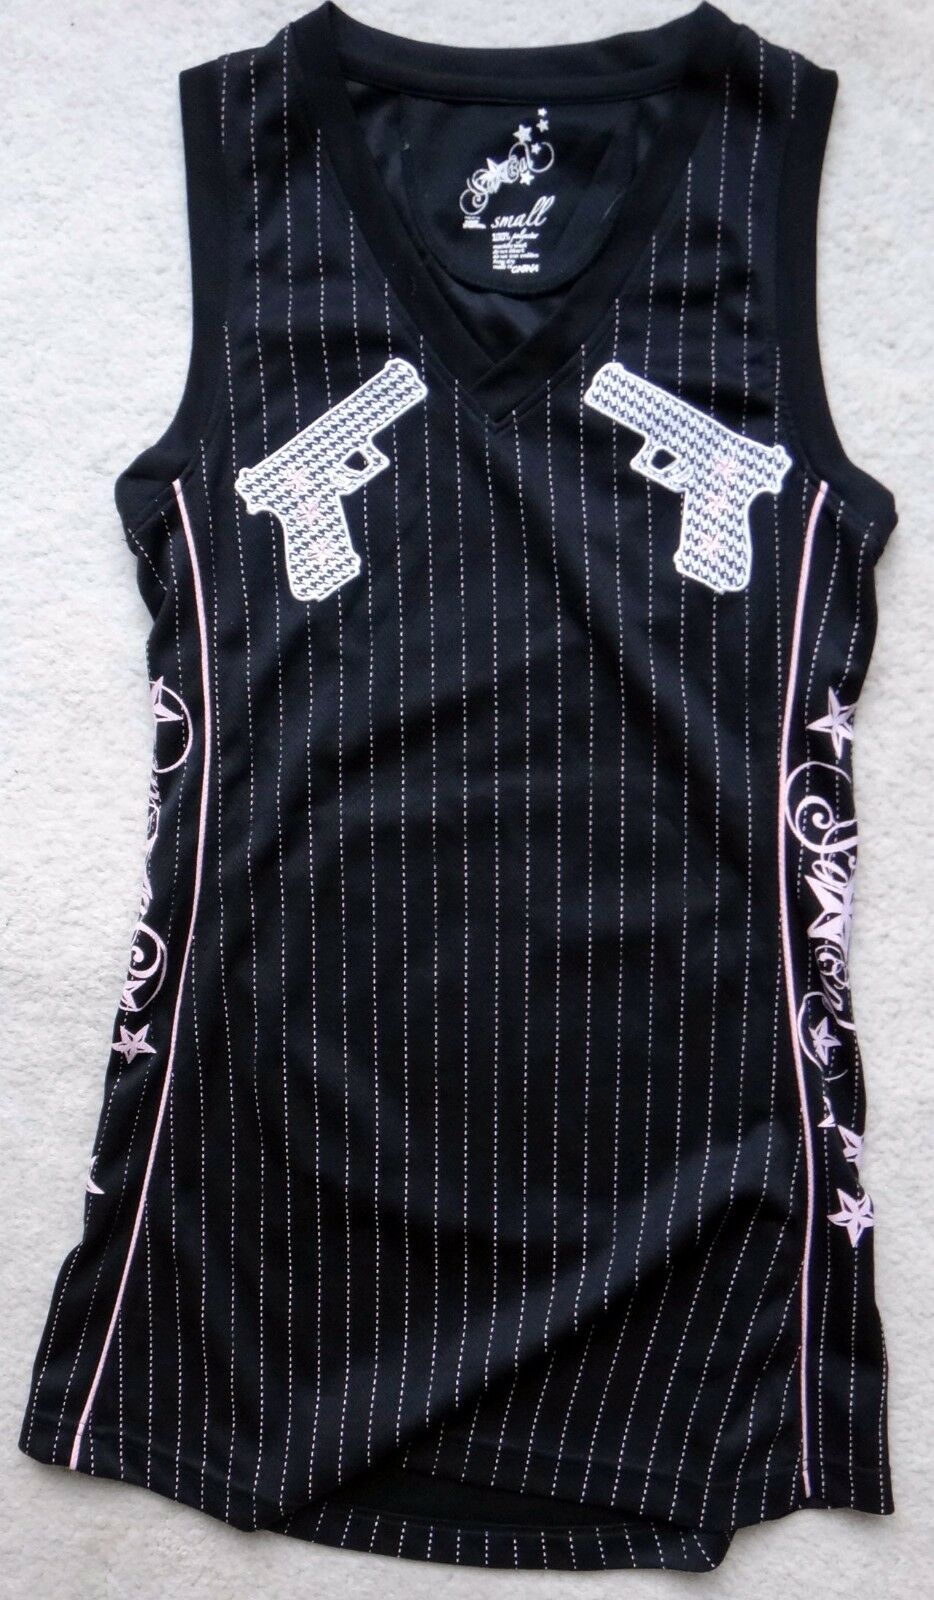 Socal WEST coast rap rap rap gangster los angeles gun pink patch baretta jersey patch b4afb5